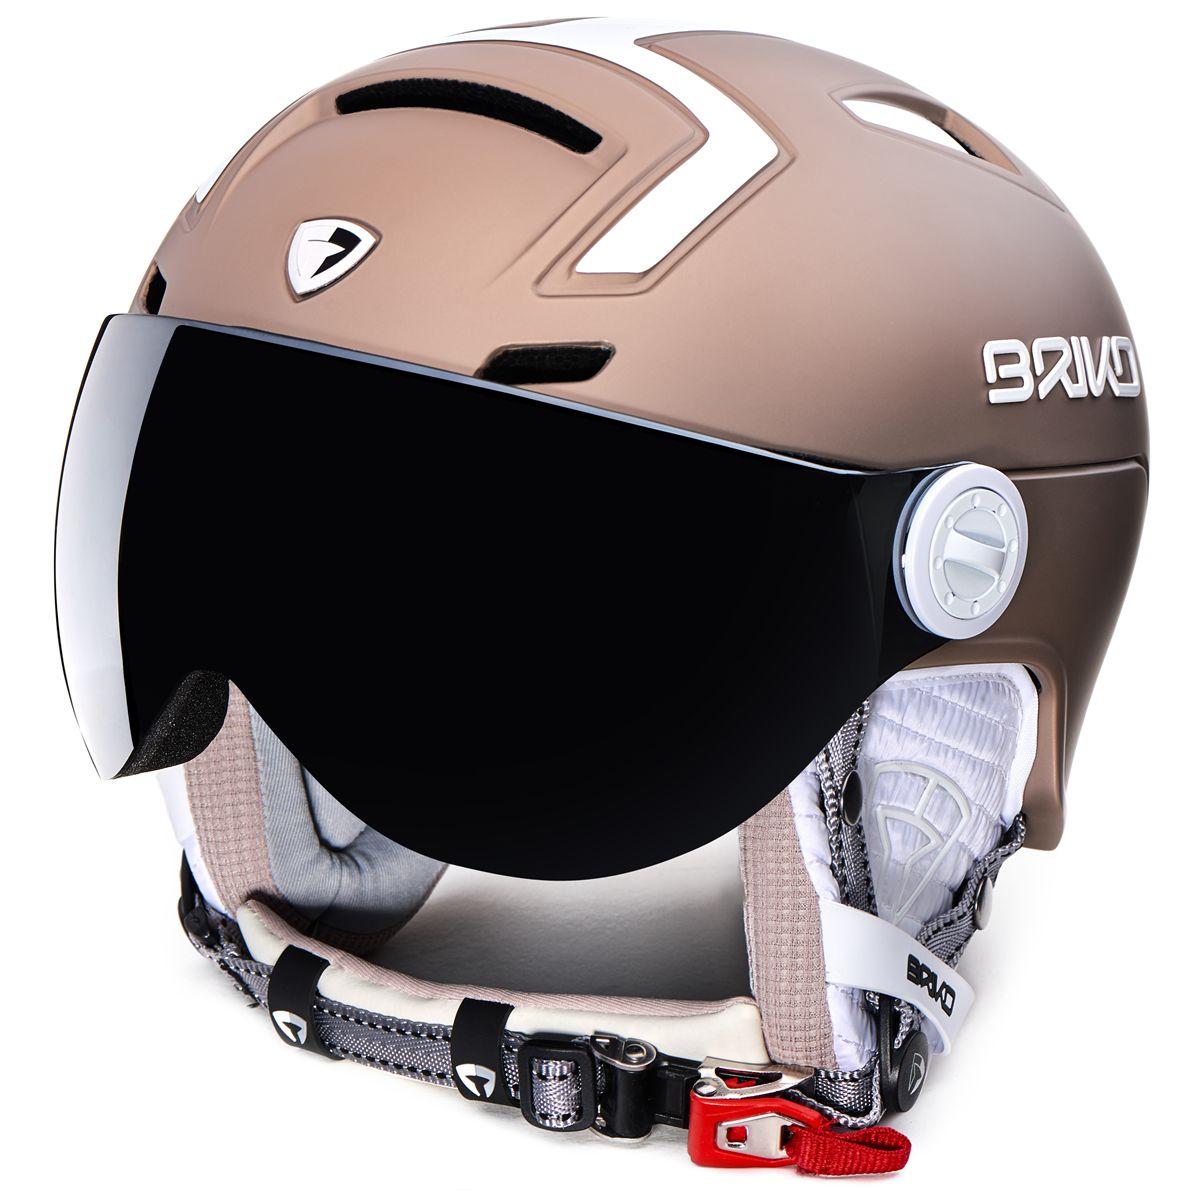 ecf180c517a5 Ski   Snow Helmet - briko Stromboli Visor 1V